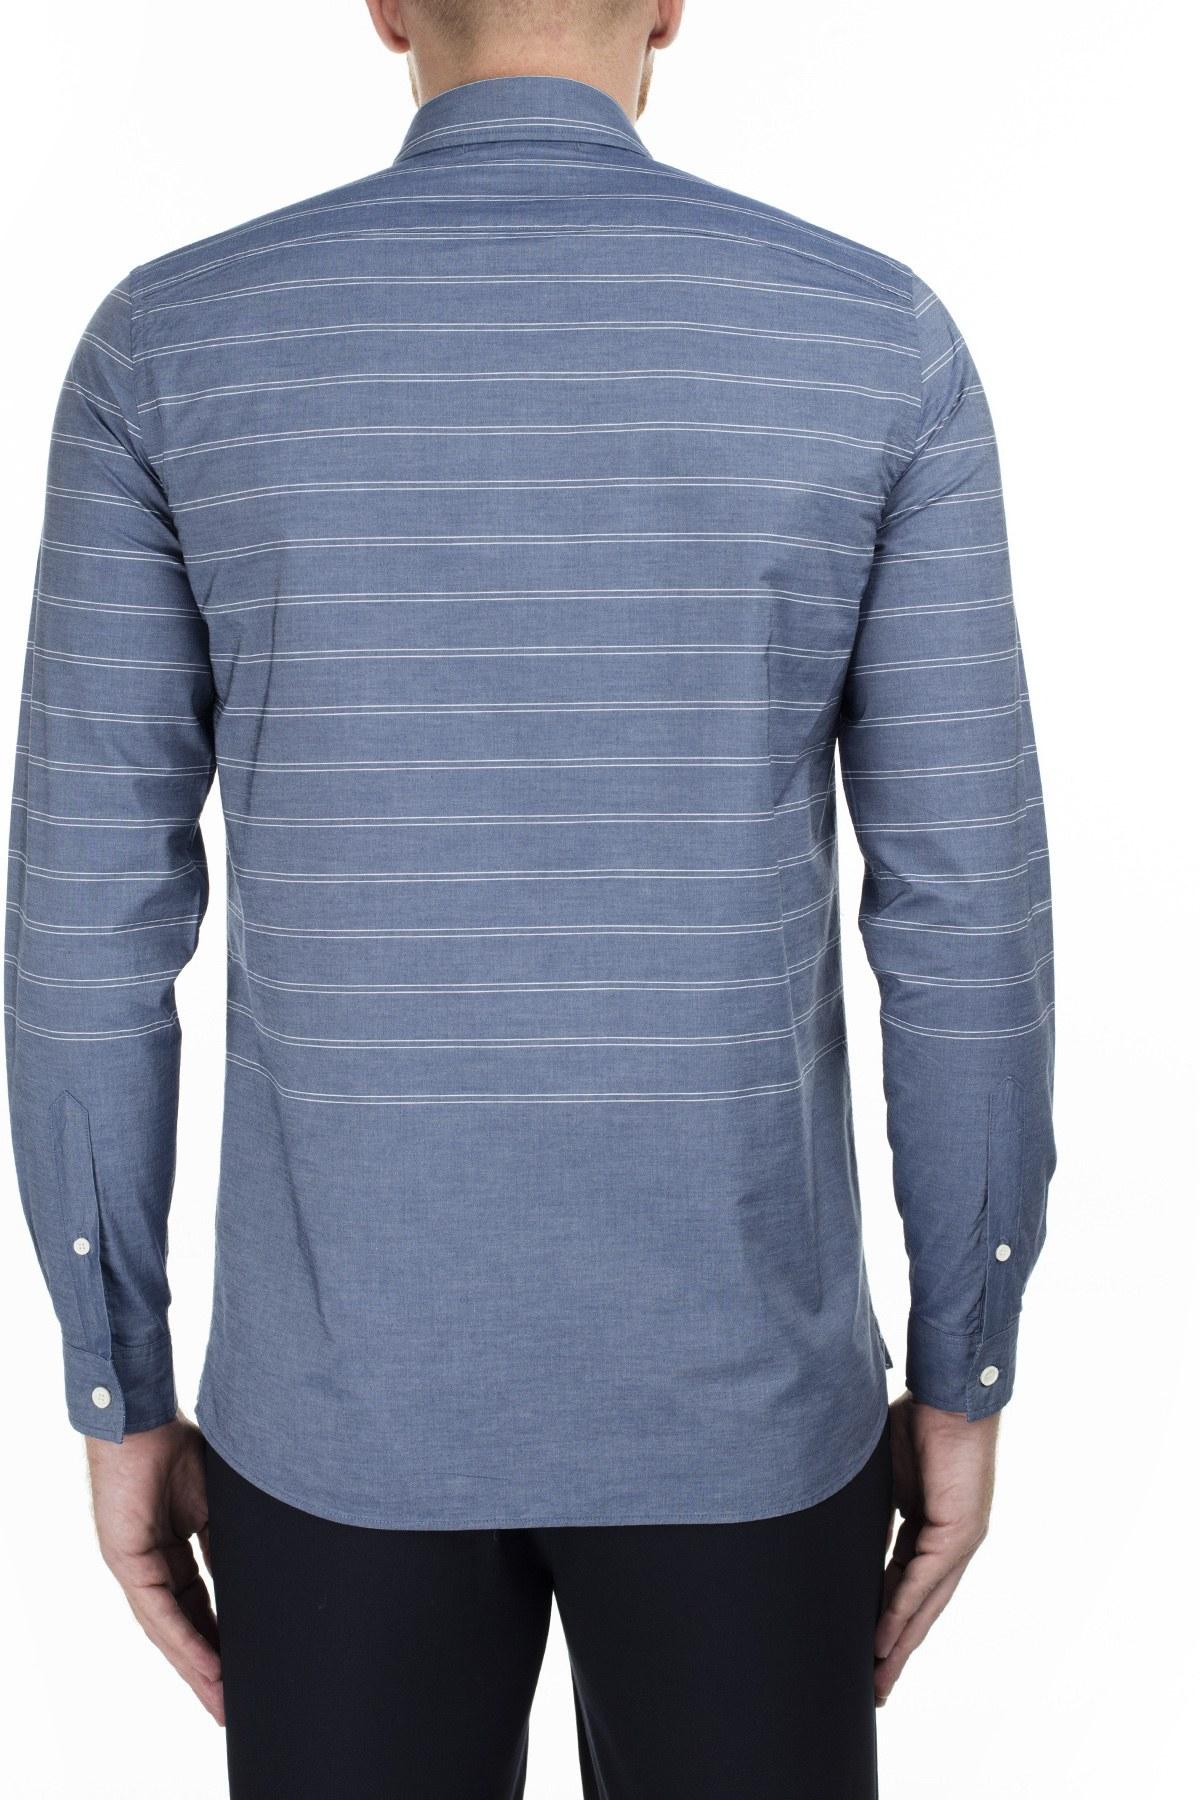 Lacoste Erkek Gömlek S CH0935 HHW MAVİ